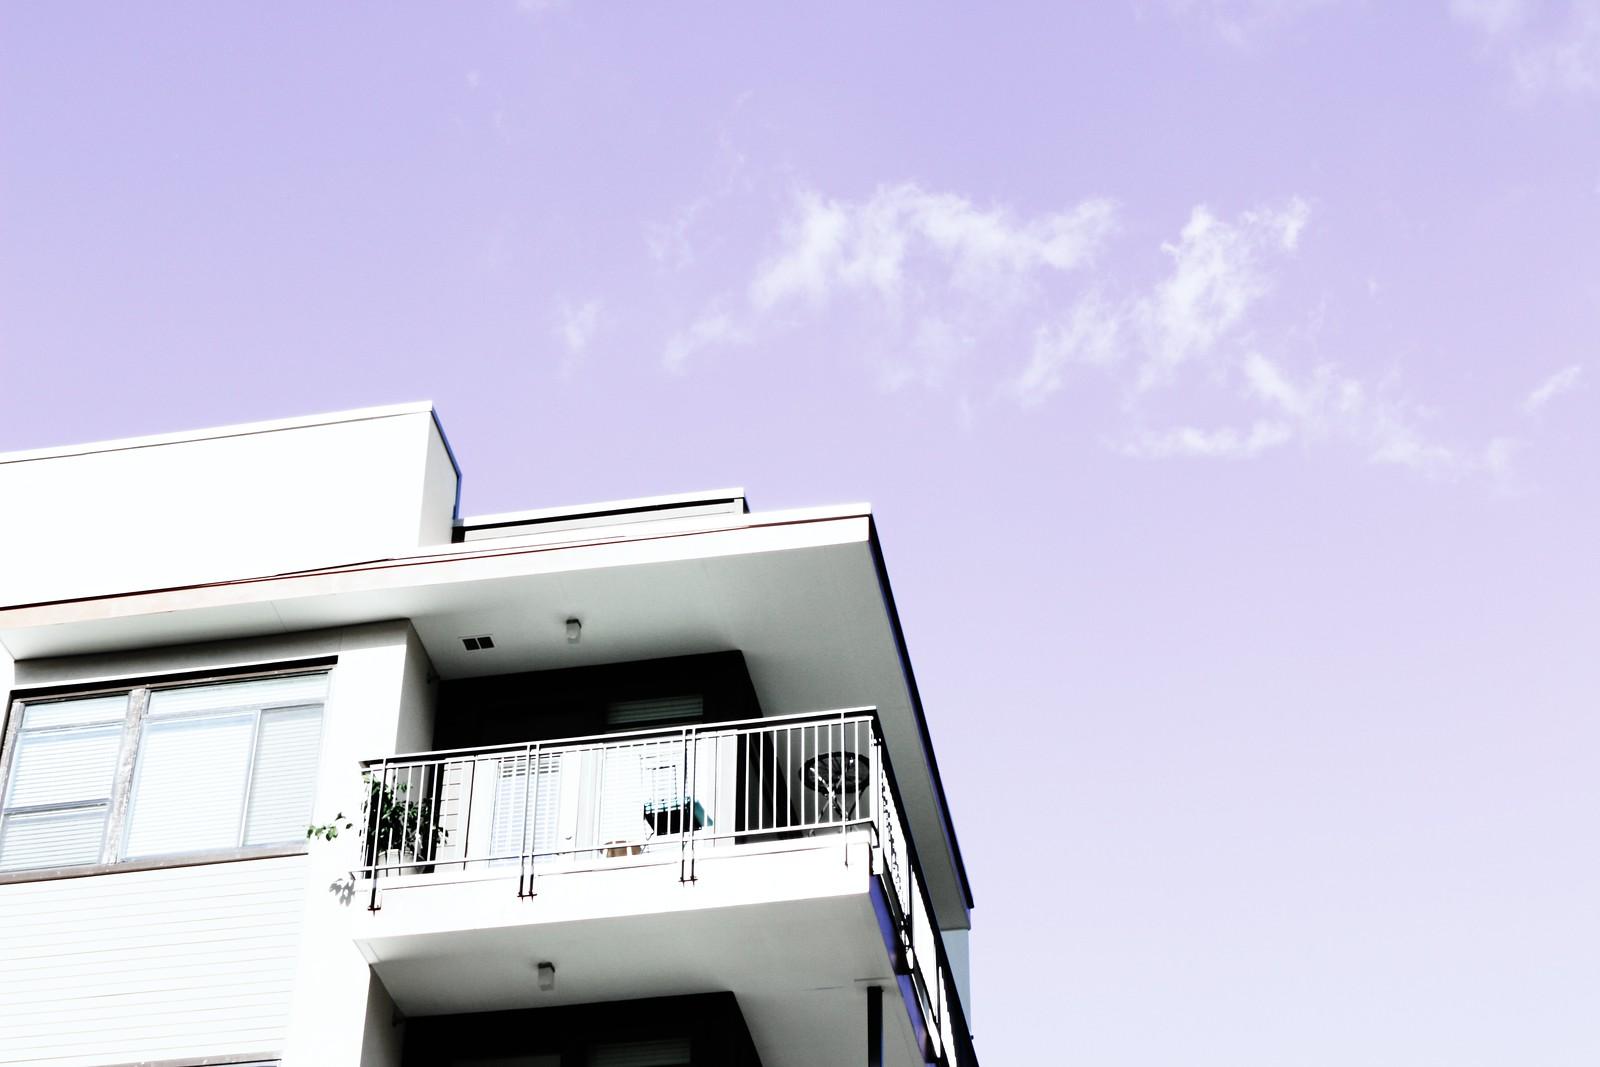 Balcony, Morgan St. Old 4th Ward. Sept 2015